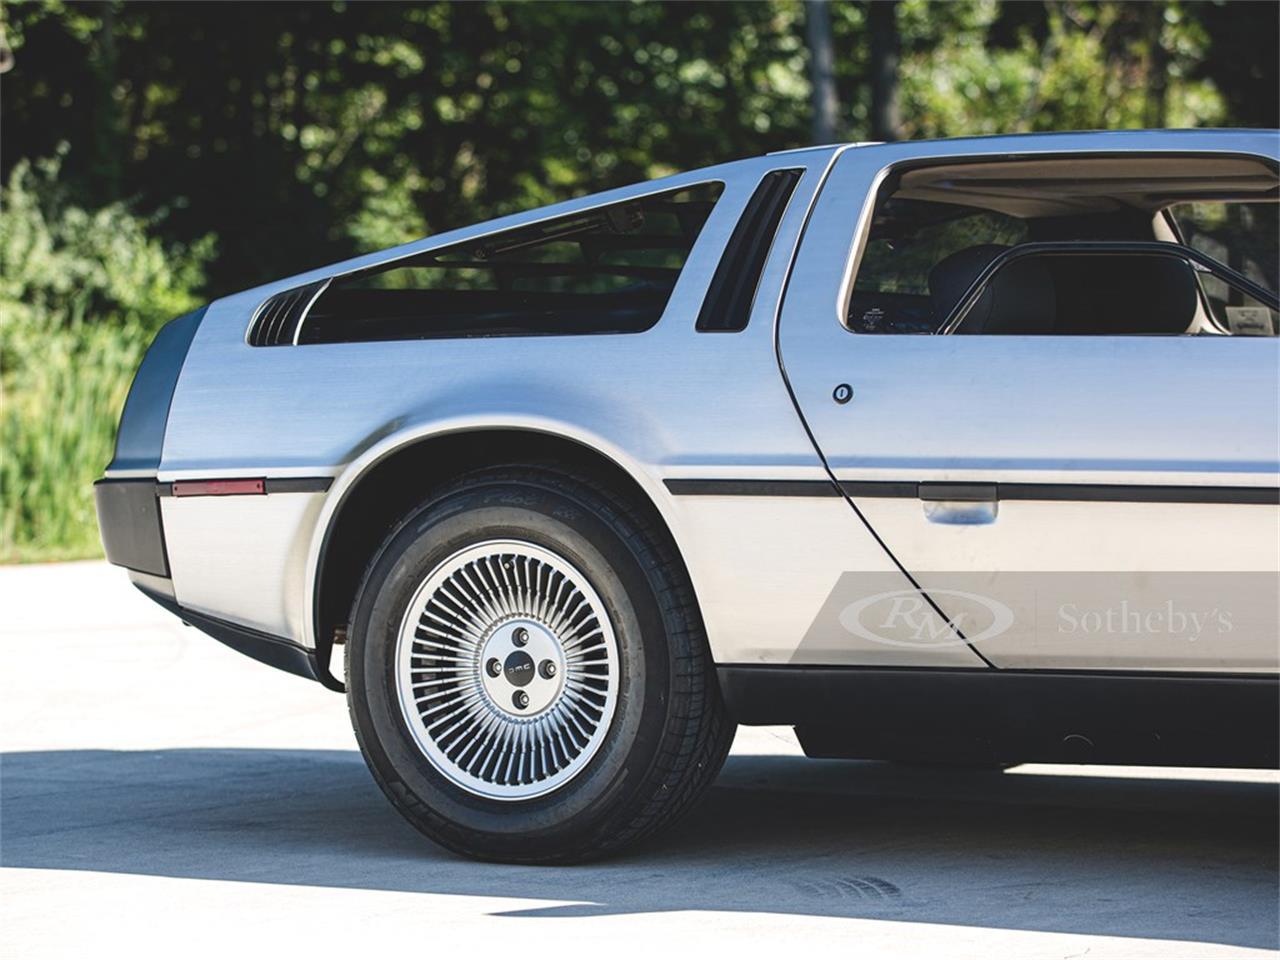 1981 DeLorean DMC-12 (CC-1333371) for sale in Elkhart, Indiana